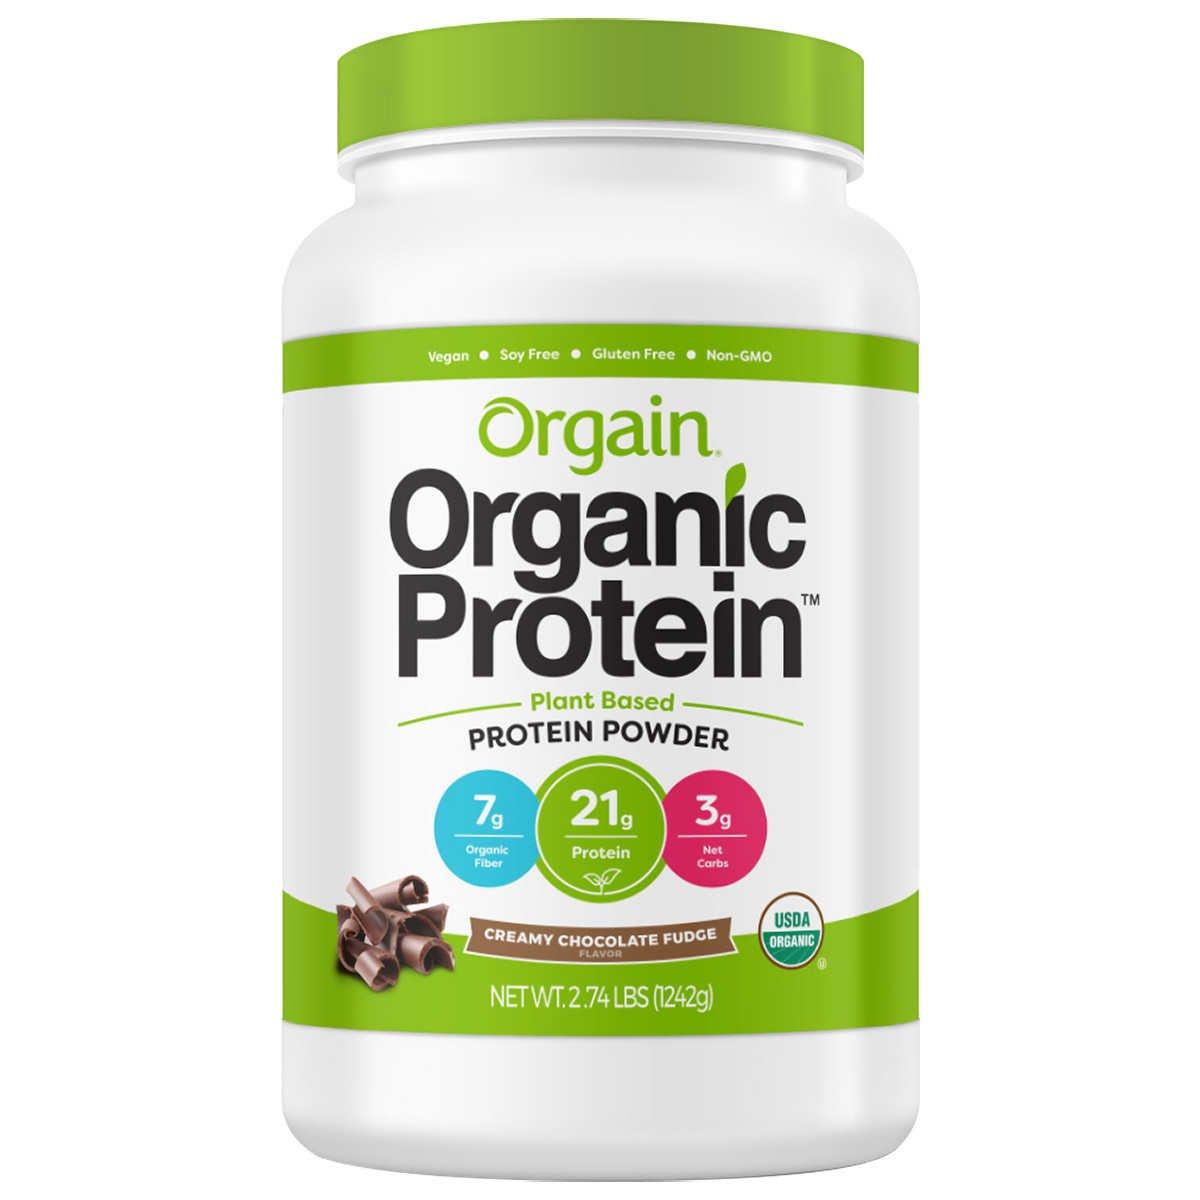 Orgain Organic Plant Based Protein Powder, Vegan, Low Net Carbs, Non Dairy, Gluten Free, Lactose Free, No Sugar Added, Soy Free, Kosher, Non-GMO (2.74 lb, ChocolateFudge) by Orgain